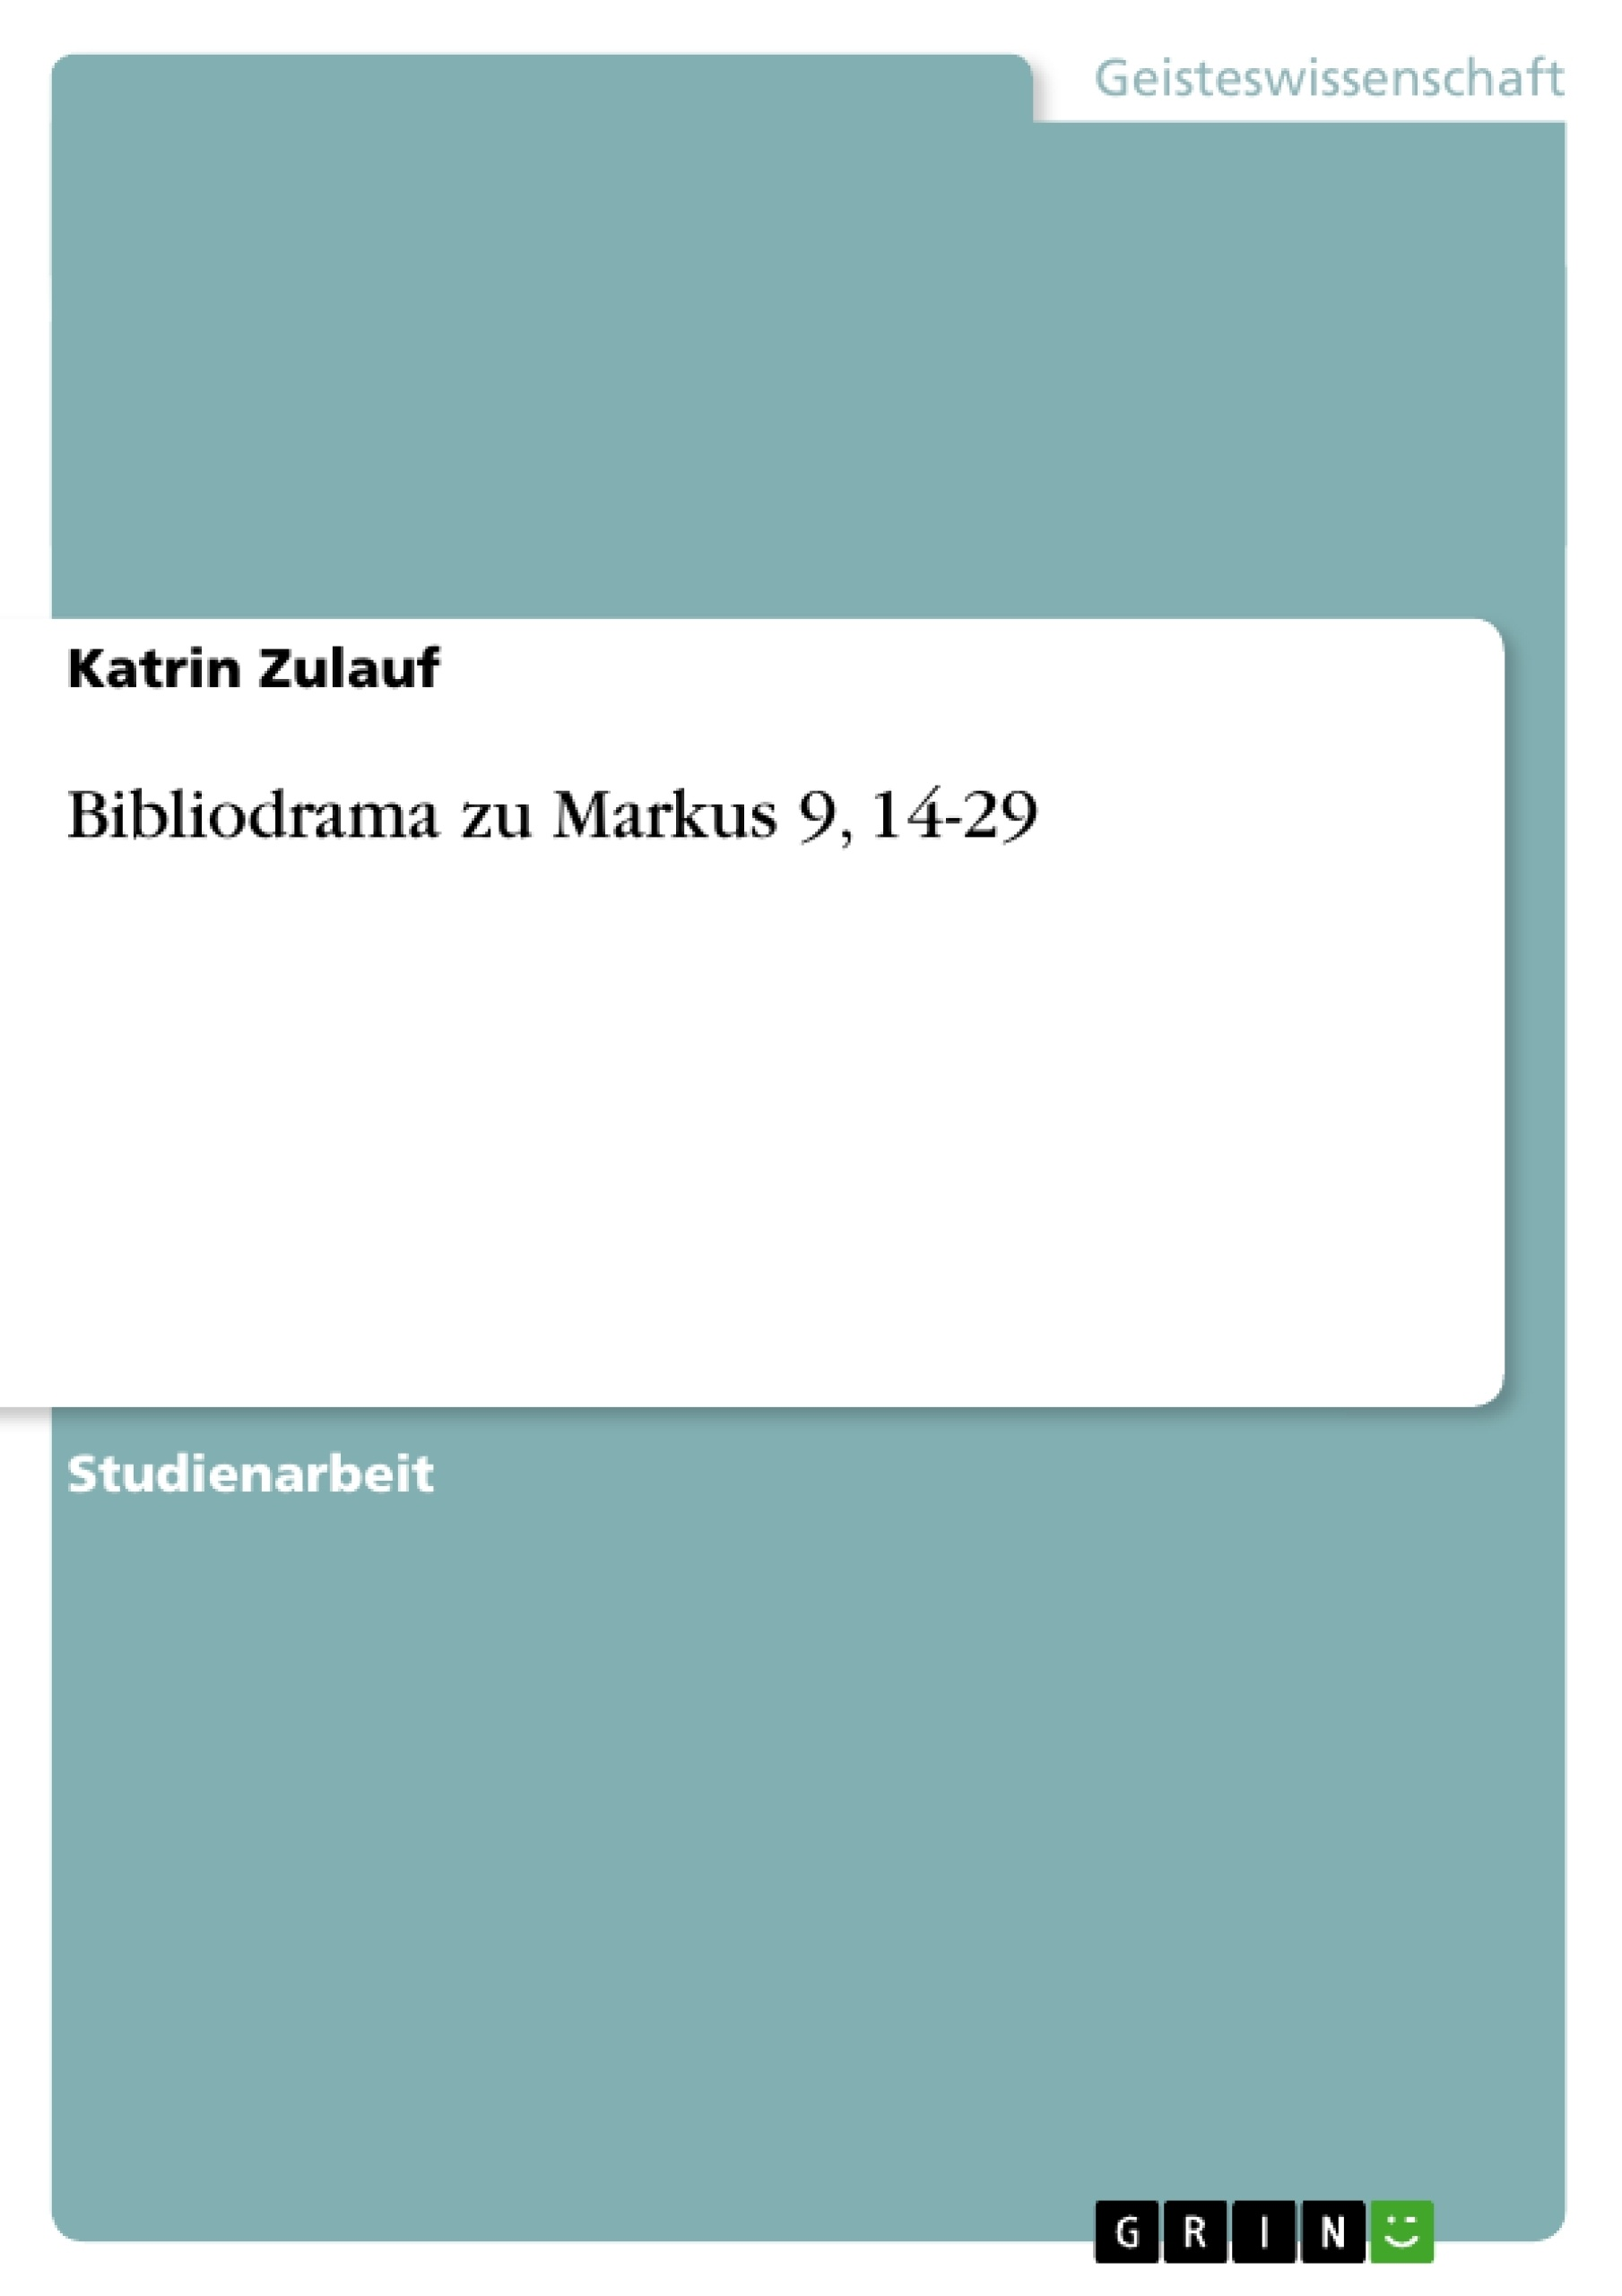 Titel: Bibliodrama zu Markus 9, 14-29